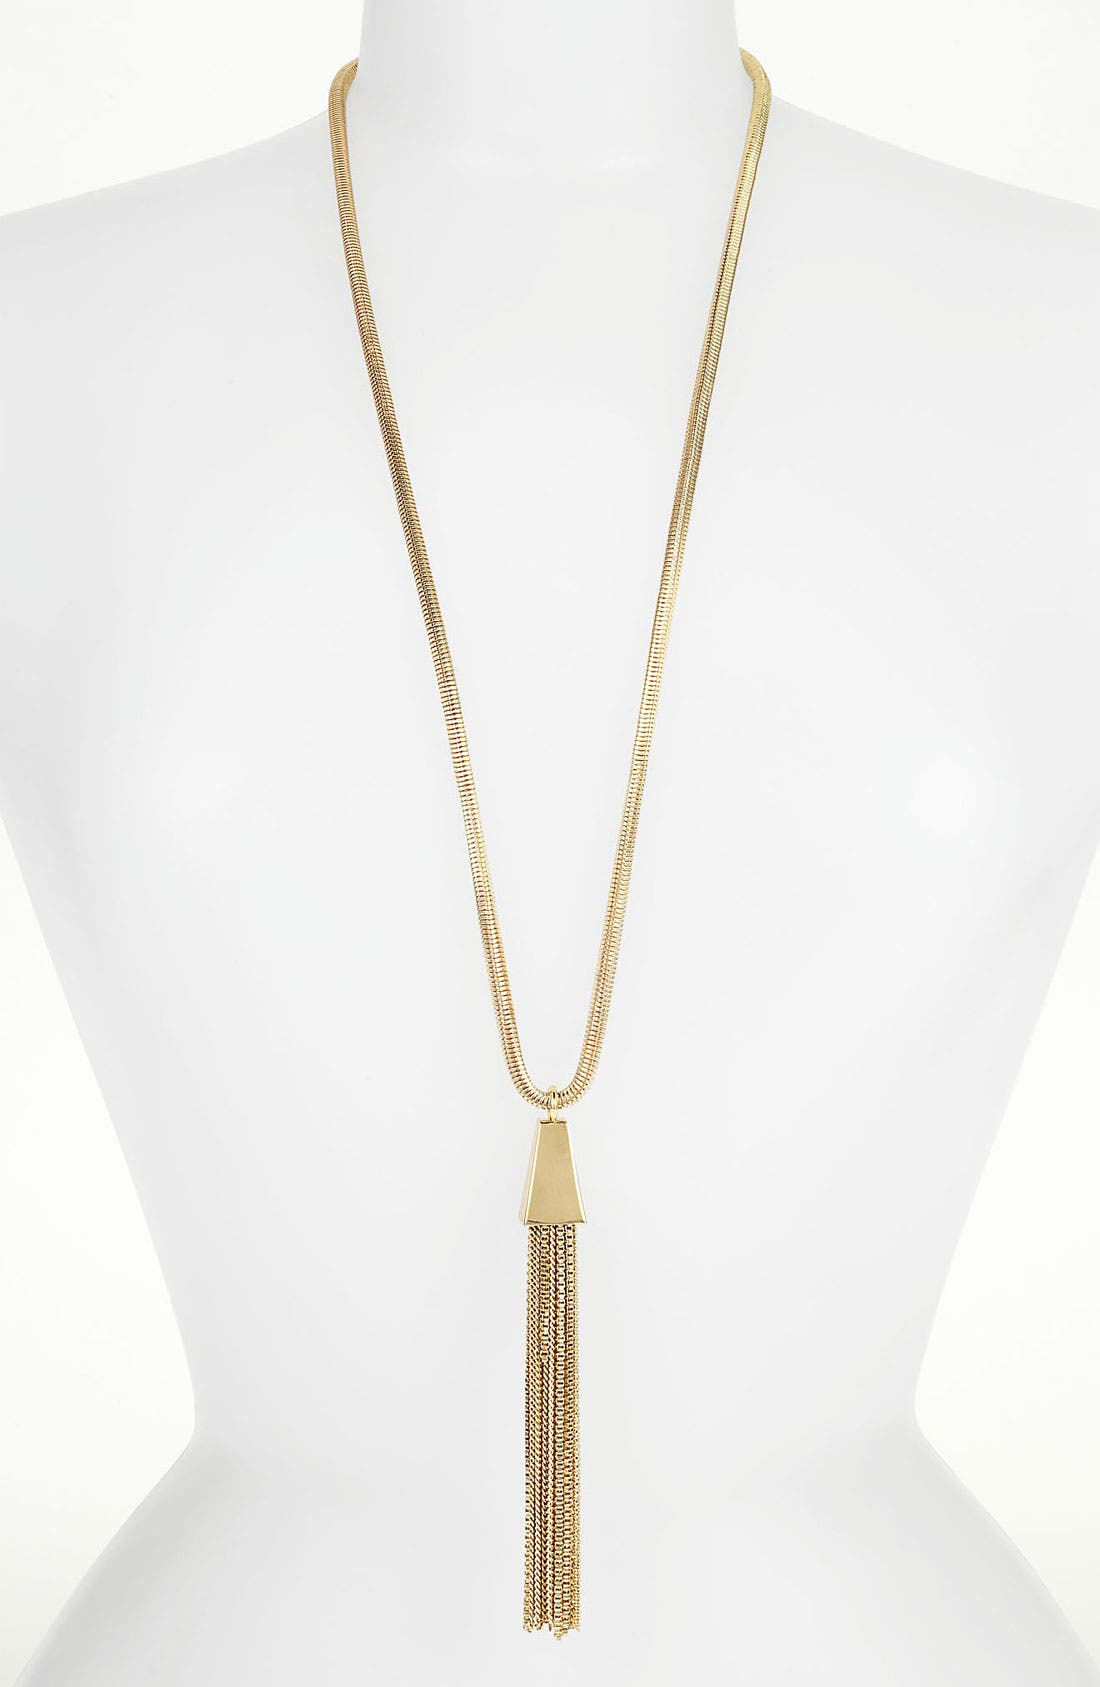 Alternate Image 1 Selected - Vince Camuto Tassel Necklace